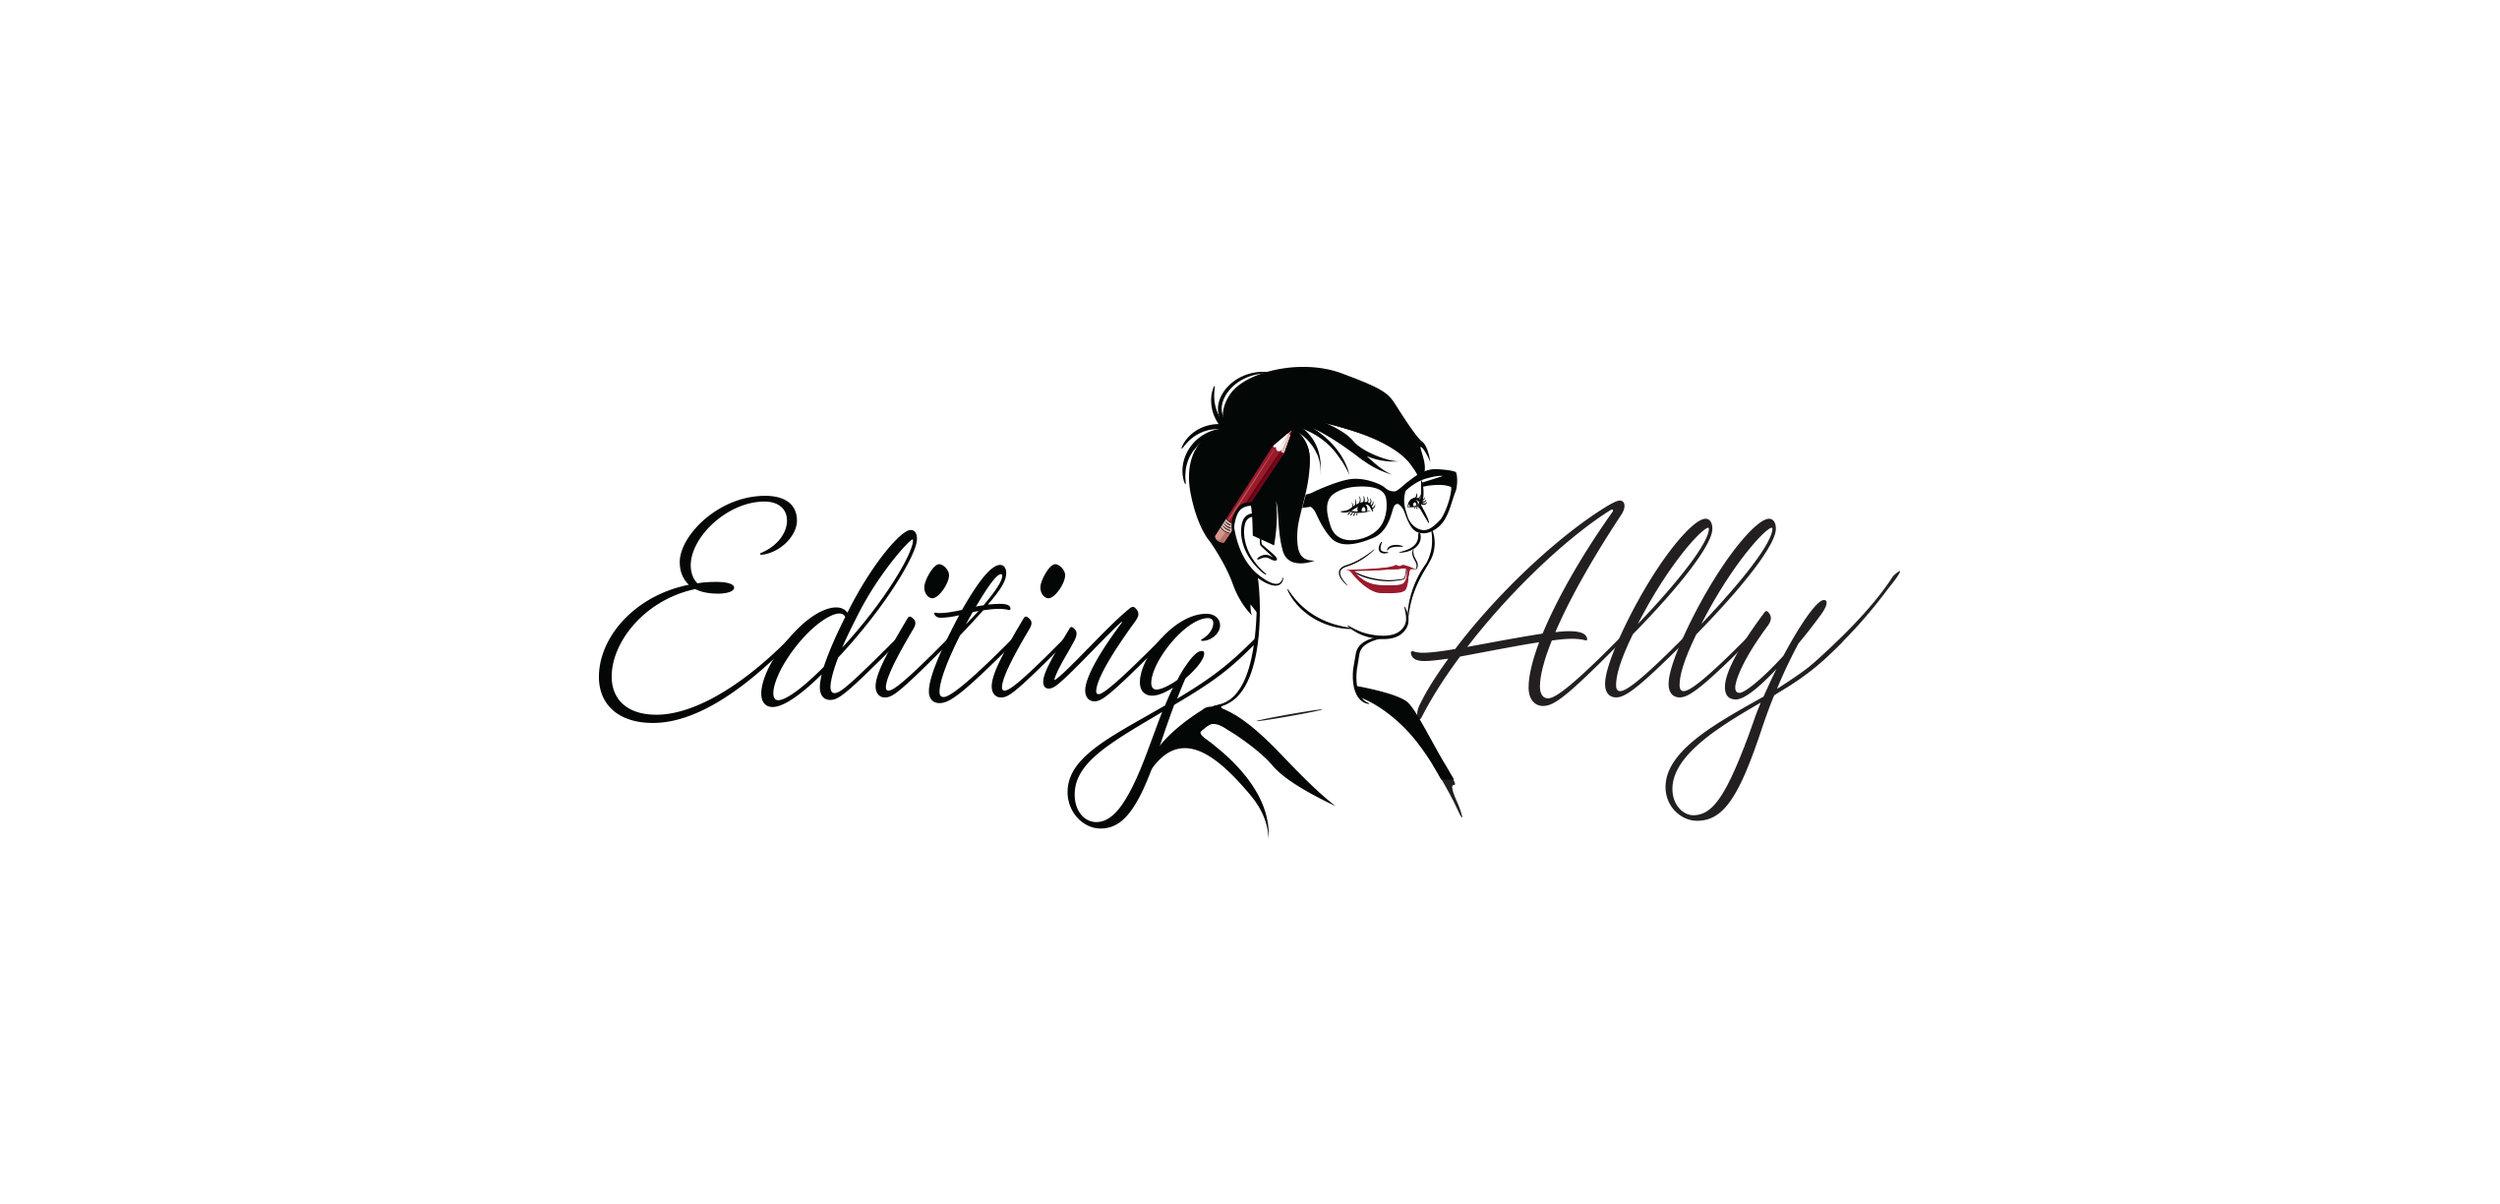 023 - Editing Ally.jpg